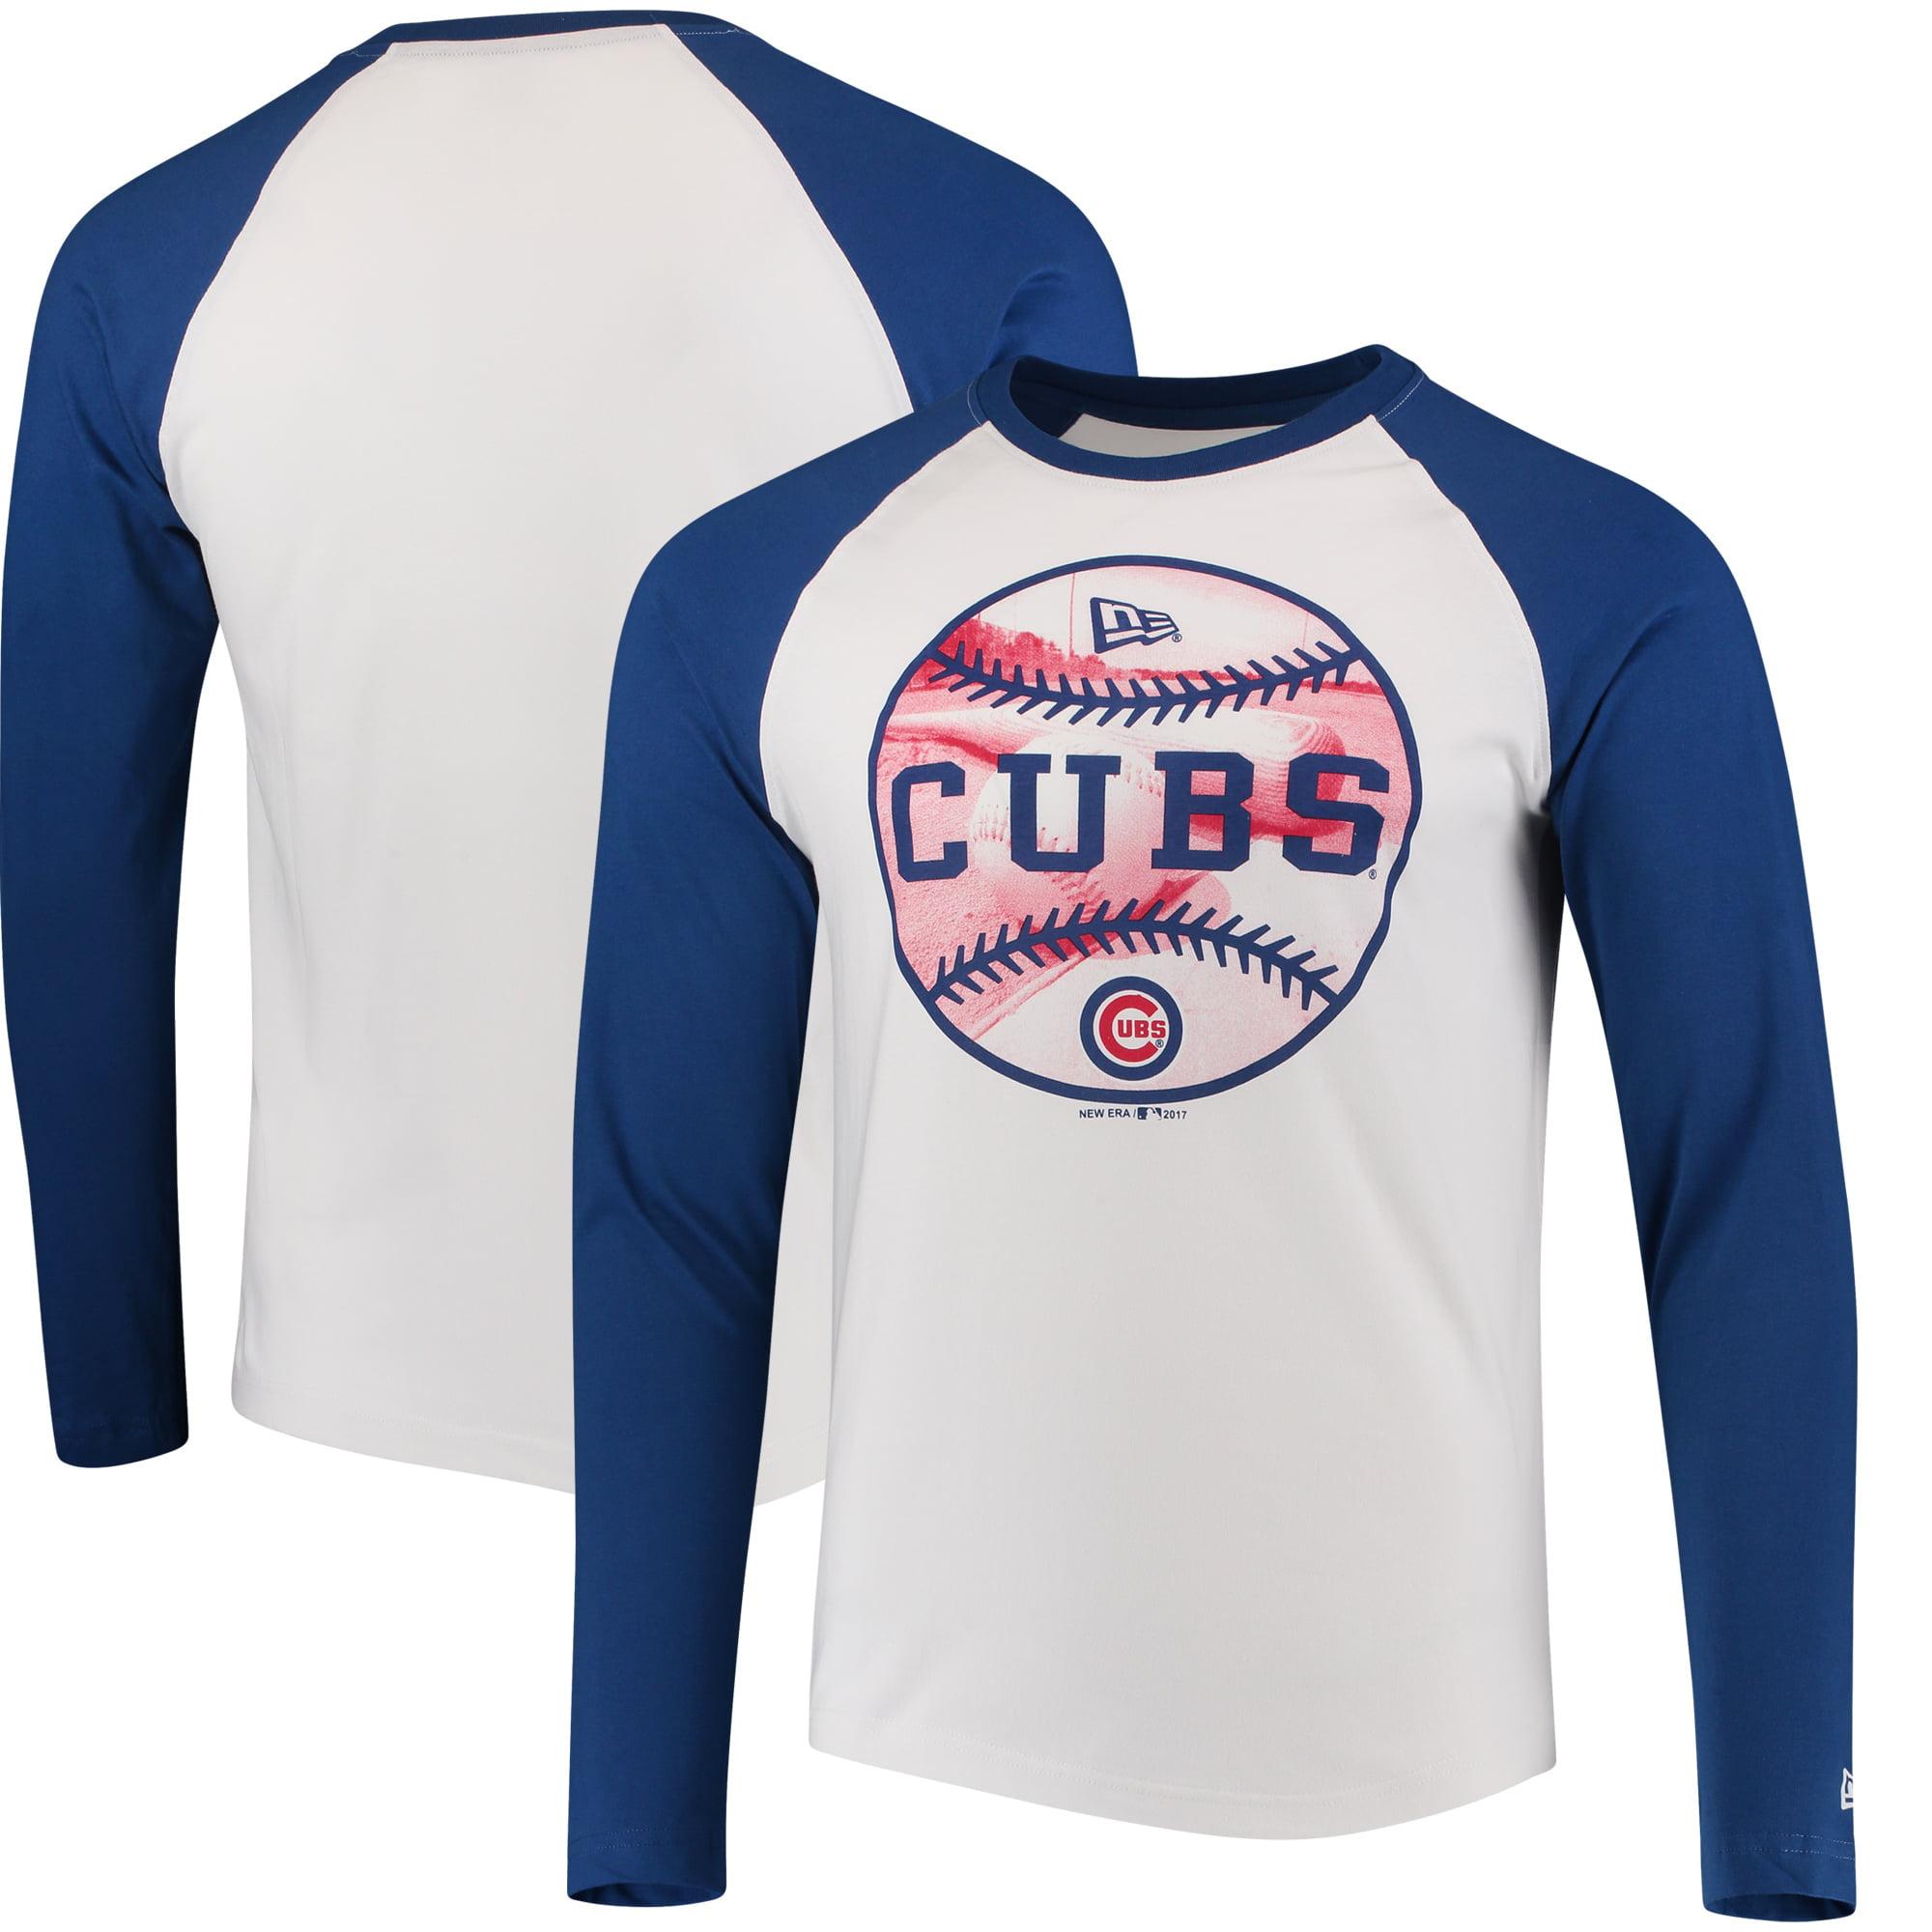 Chicago Cubs New Era Raglan Long Sleeve T-Shirt - White/Royal